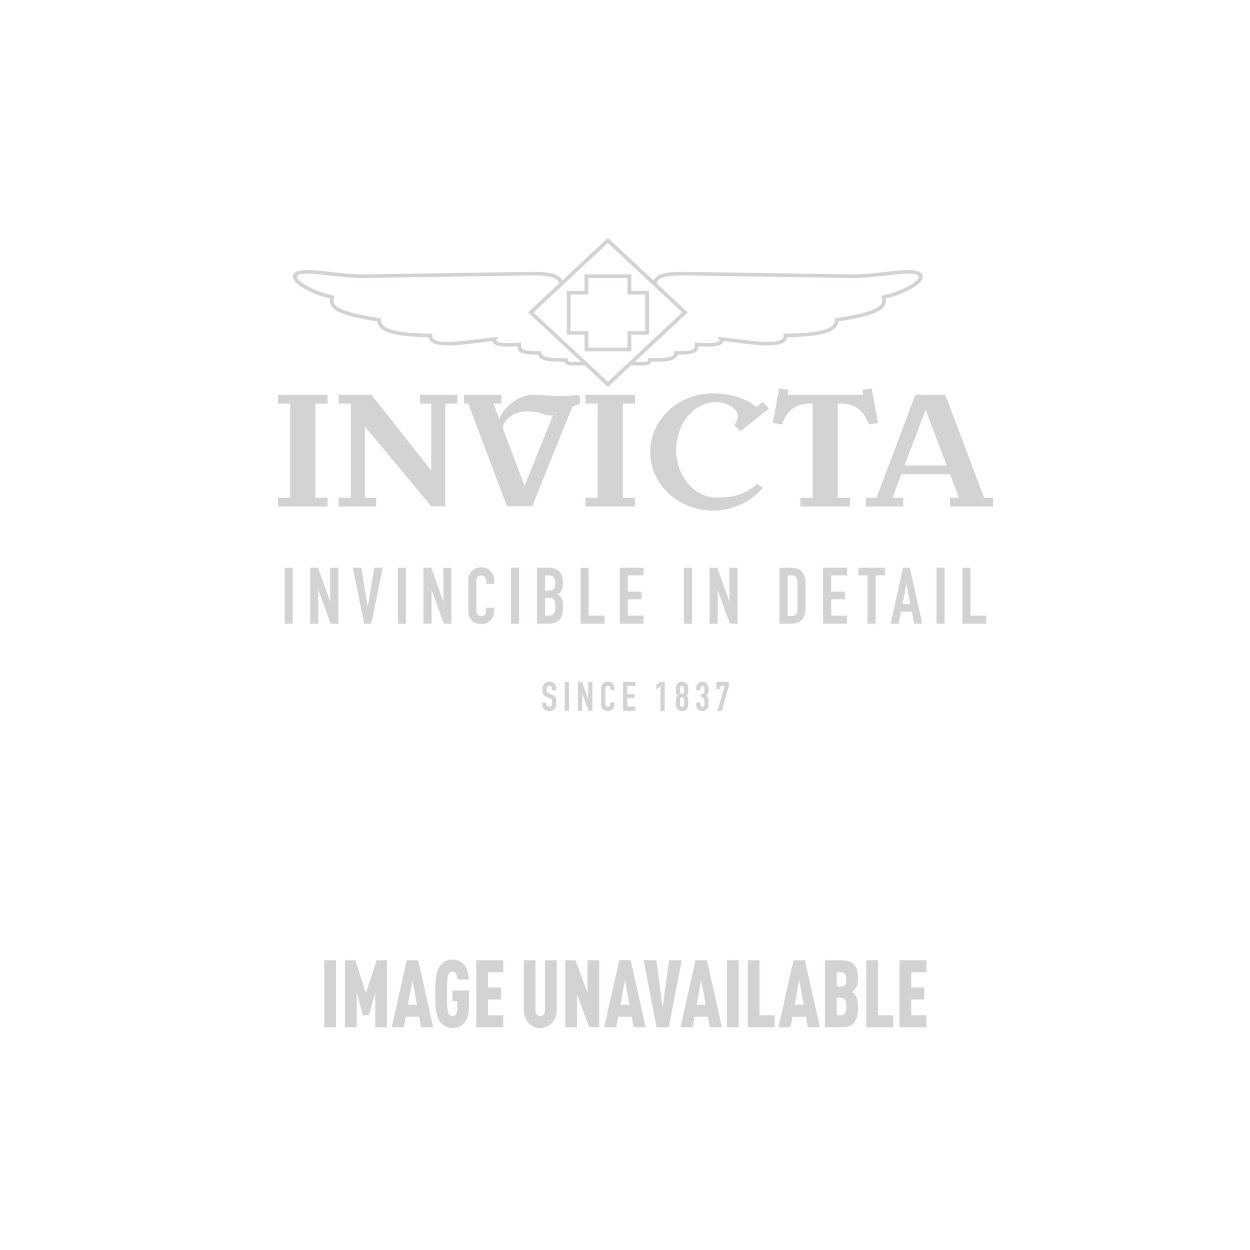 Invicta Marvel Limited Edition Tony Stark  Mens Quartz 43.5mm Gold Case Red, Blue, Gold Dial - Model 27025